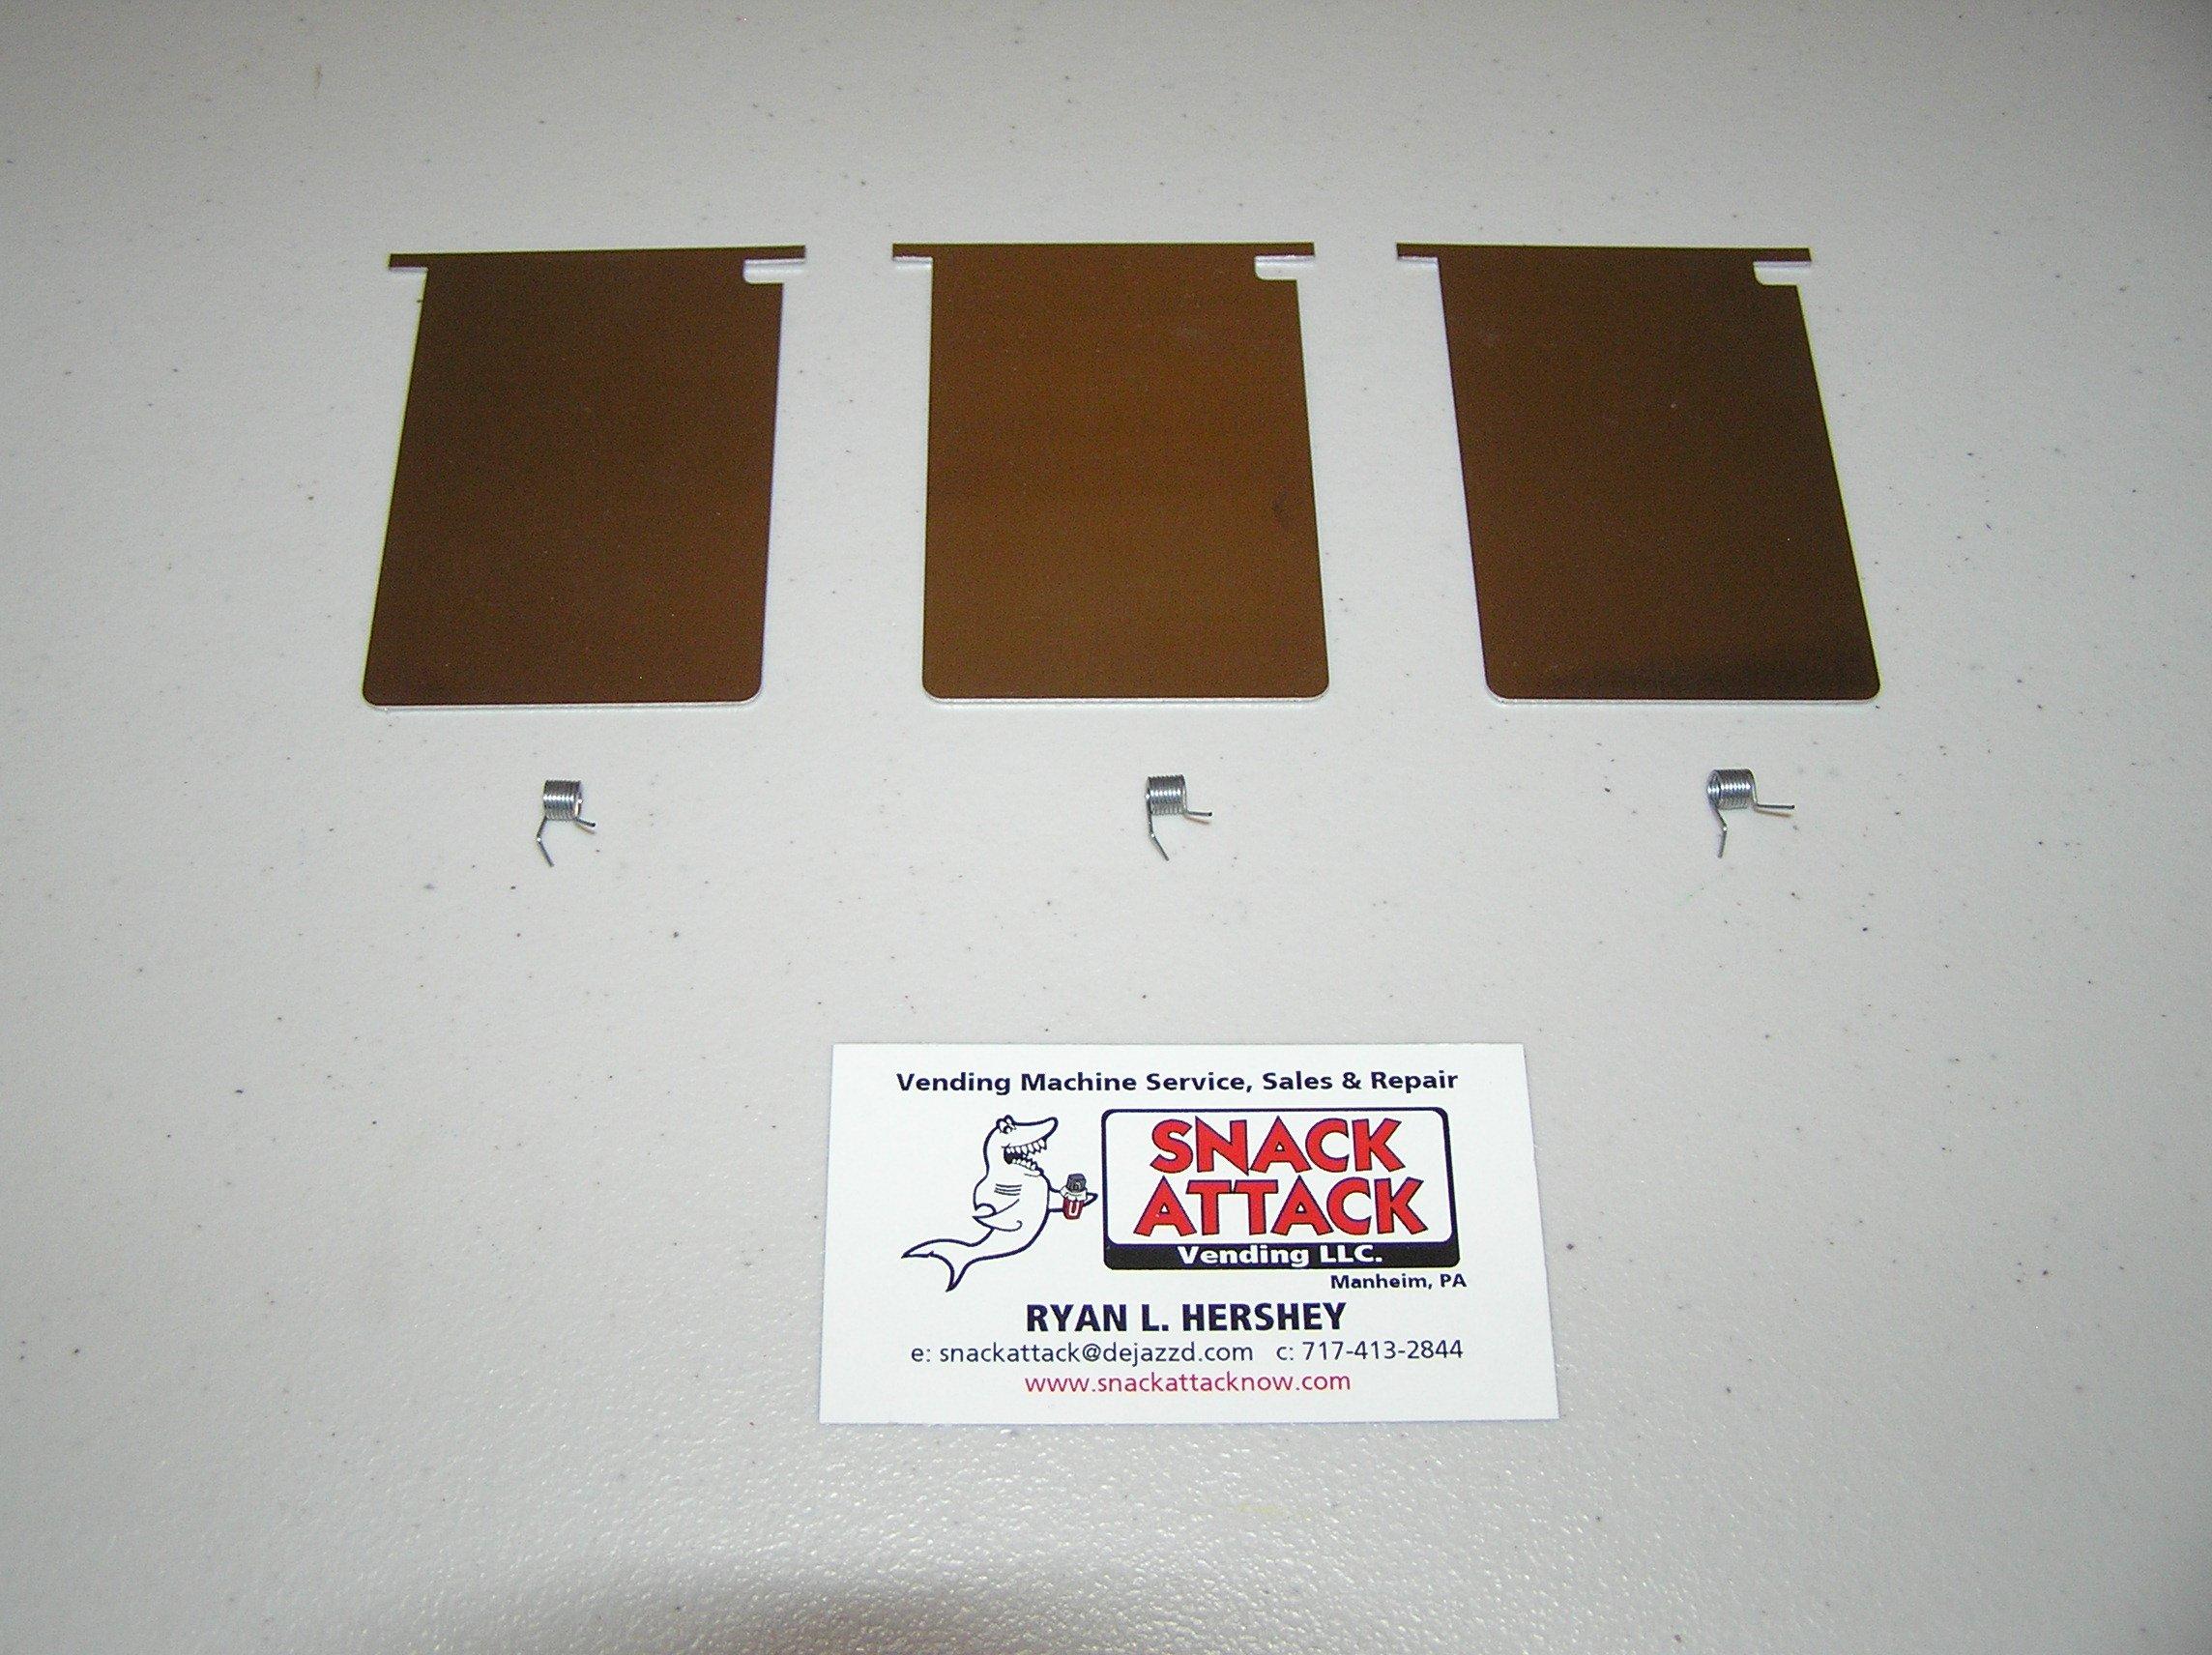 VENDSTAR 3000 (3) STAINLESS STEEL CHUTE DOORS & SPRINGS - L@@K! /! by Snack Attack Vending